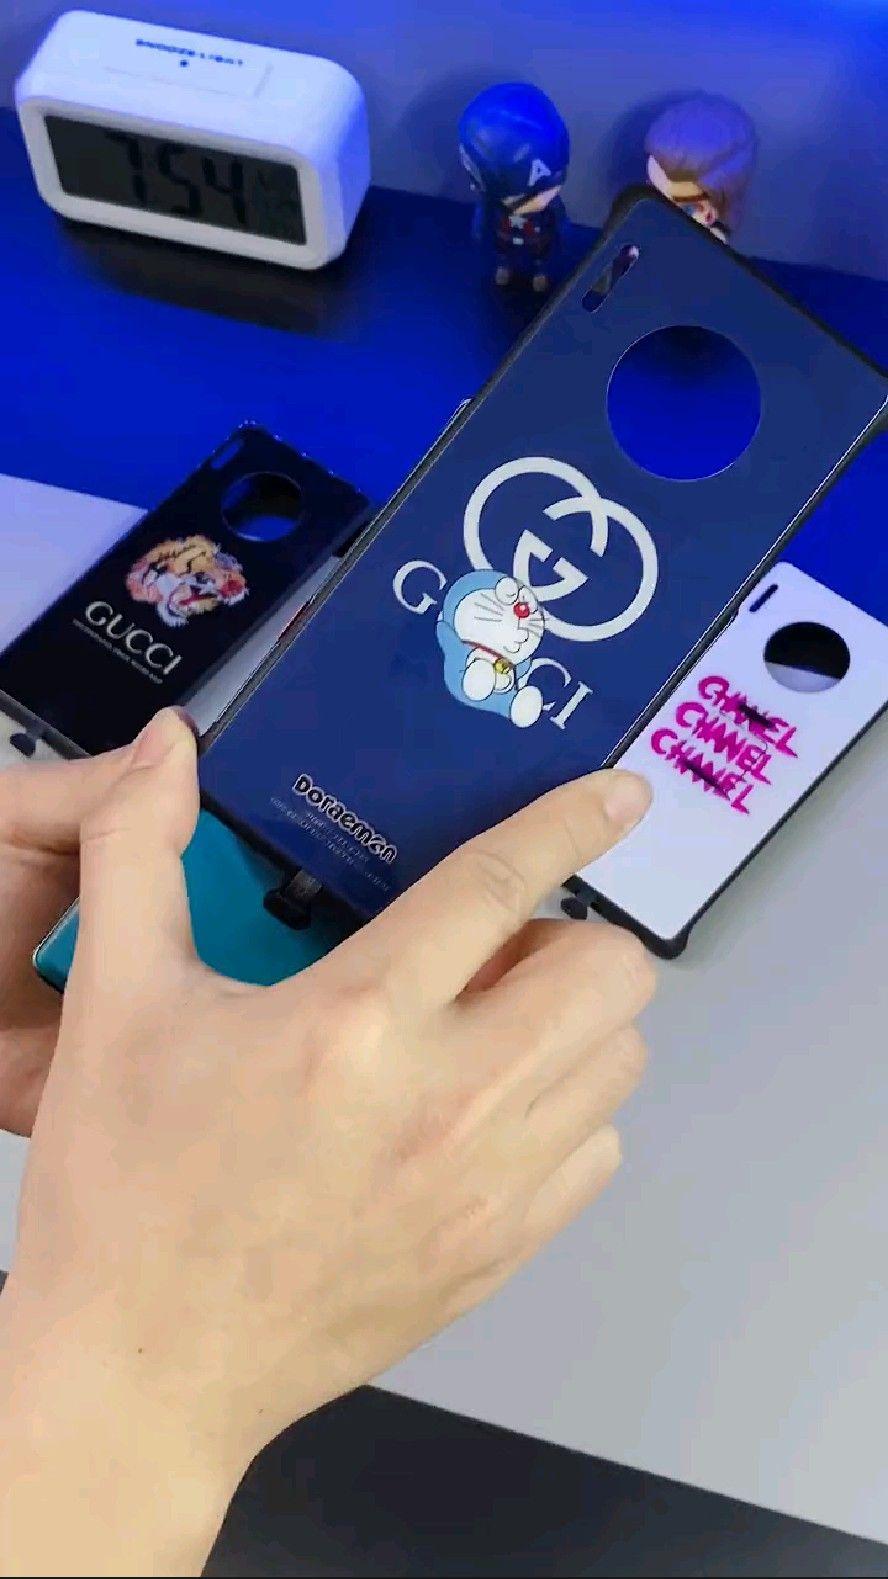 New gadgets 2021   New Gadgets   Smart Appliances   Utensils for home   ideas